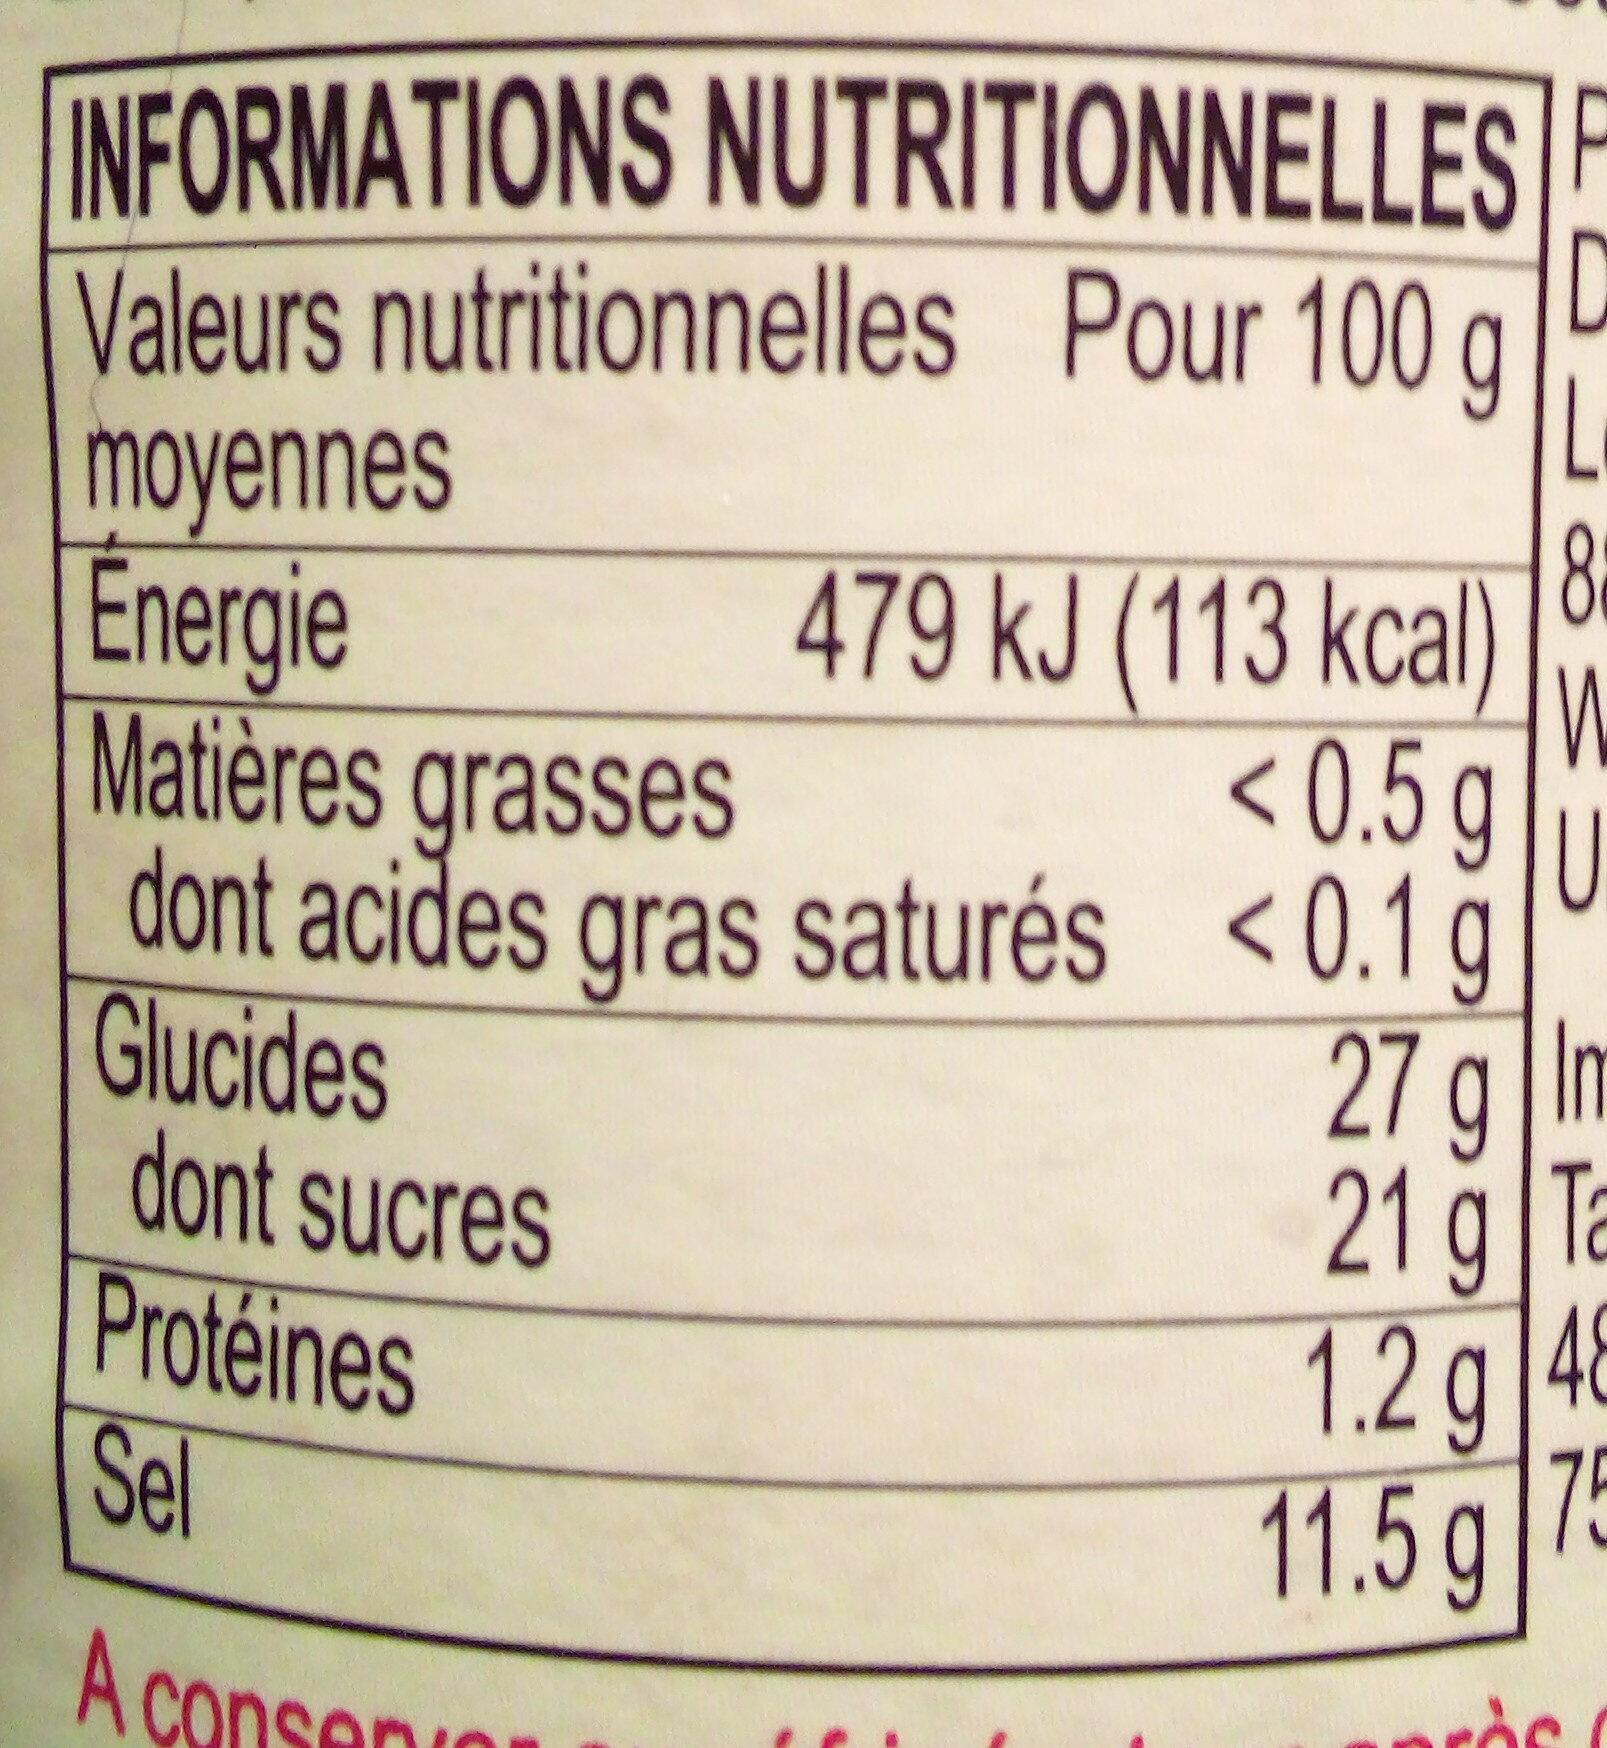 Panda brand oyster sauce - Informations nutritionnelles - fr